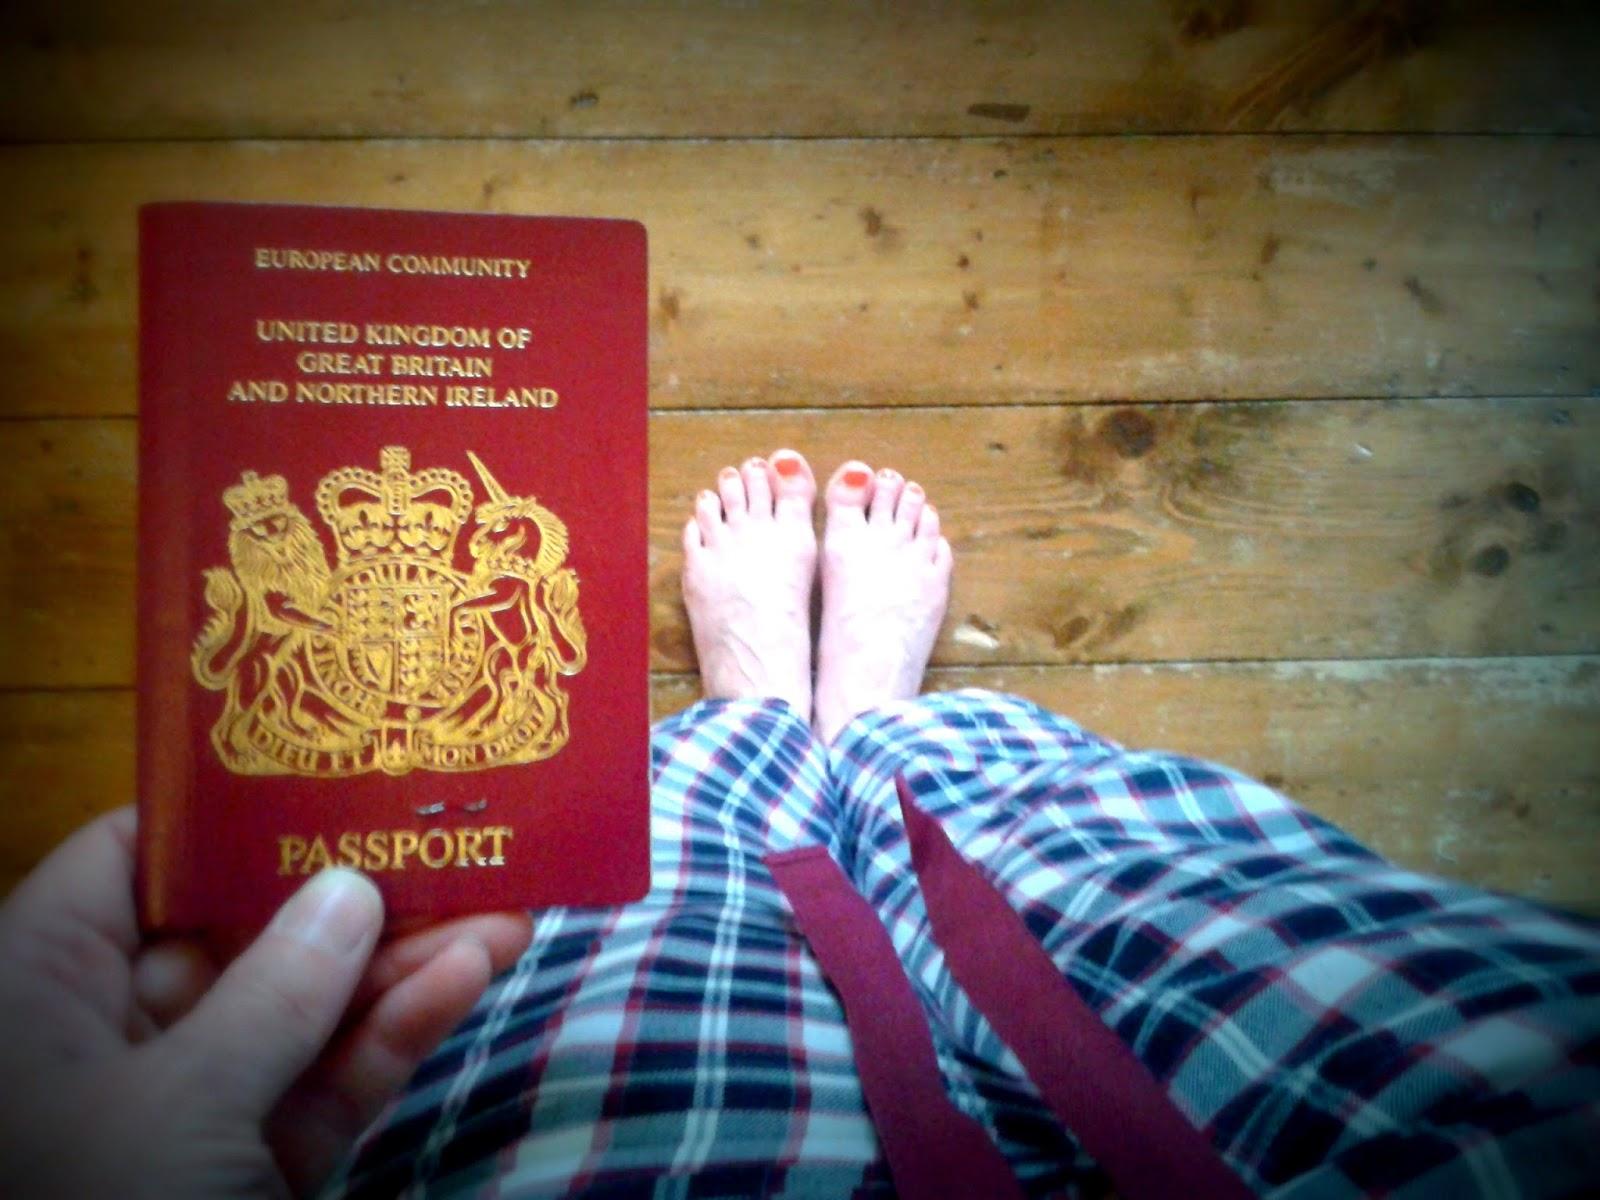 Project 365 Day 142 - Passport // 76sunflowers